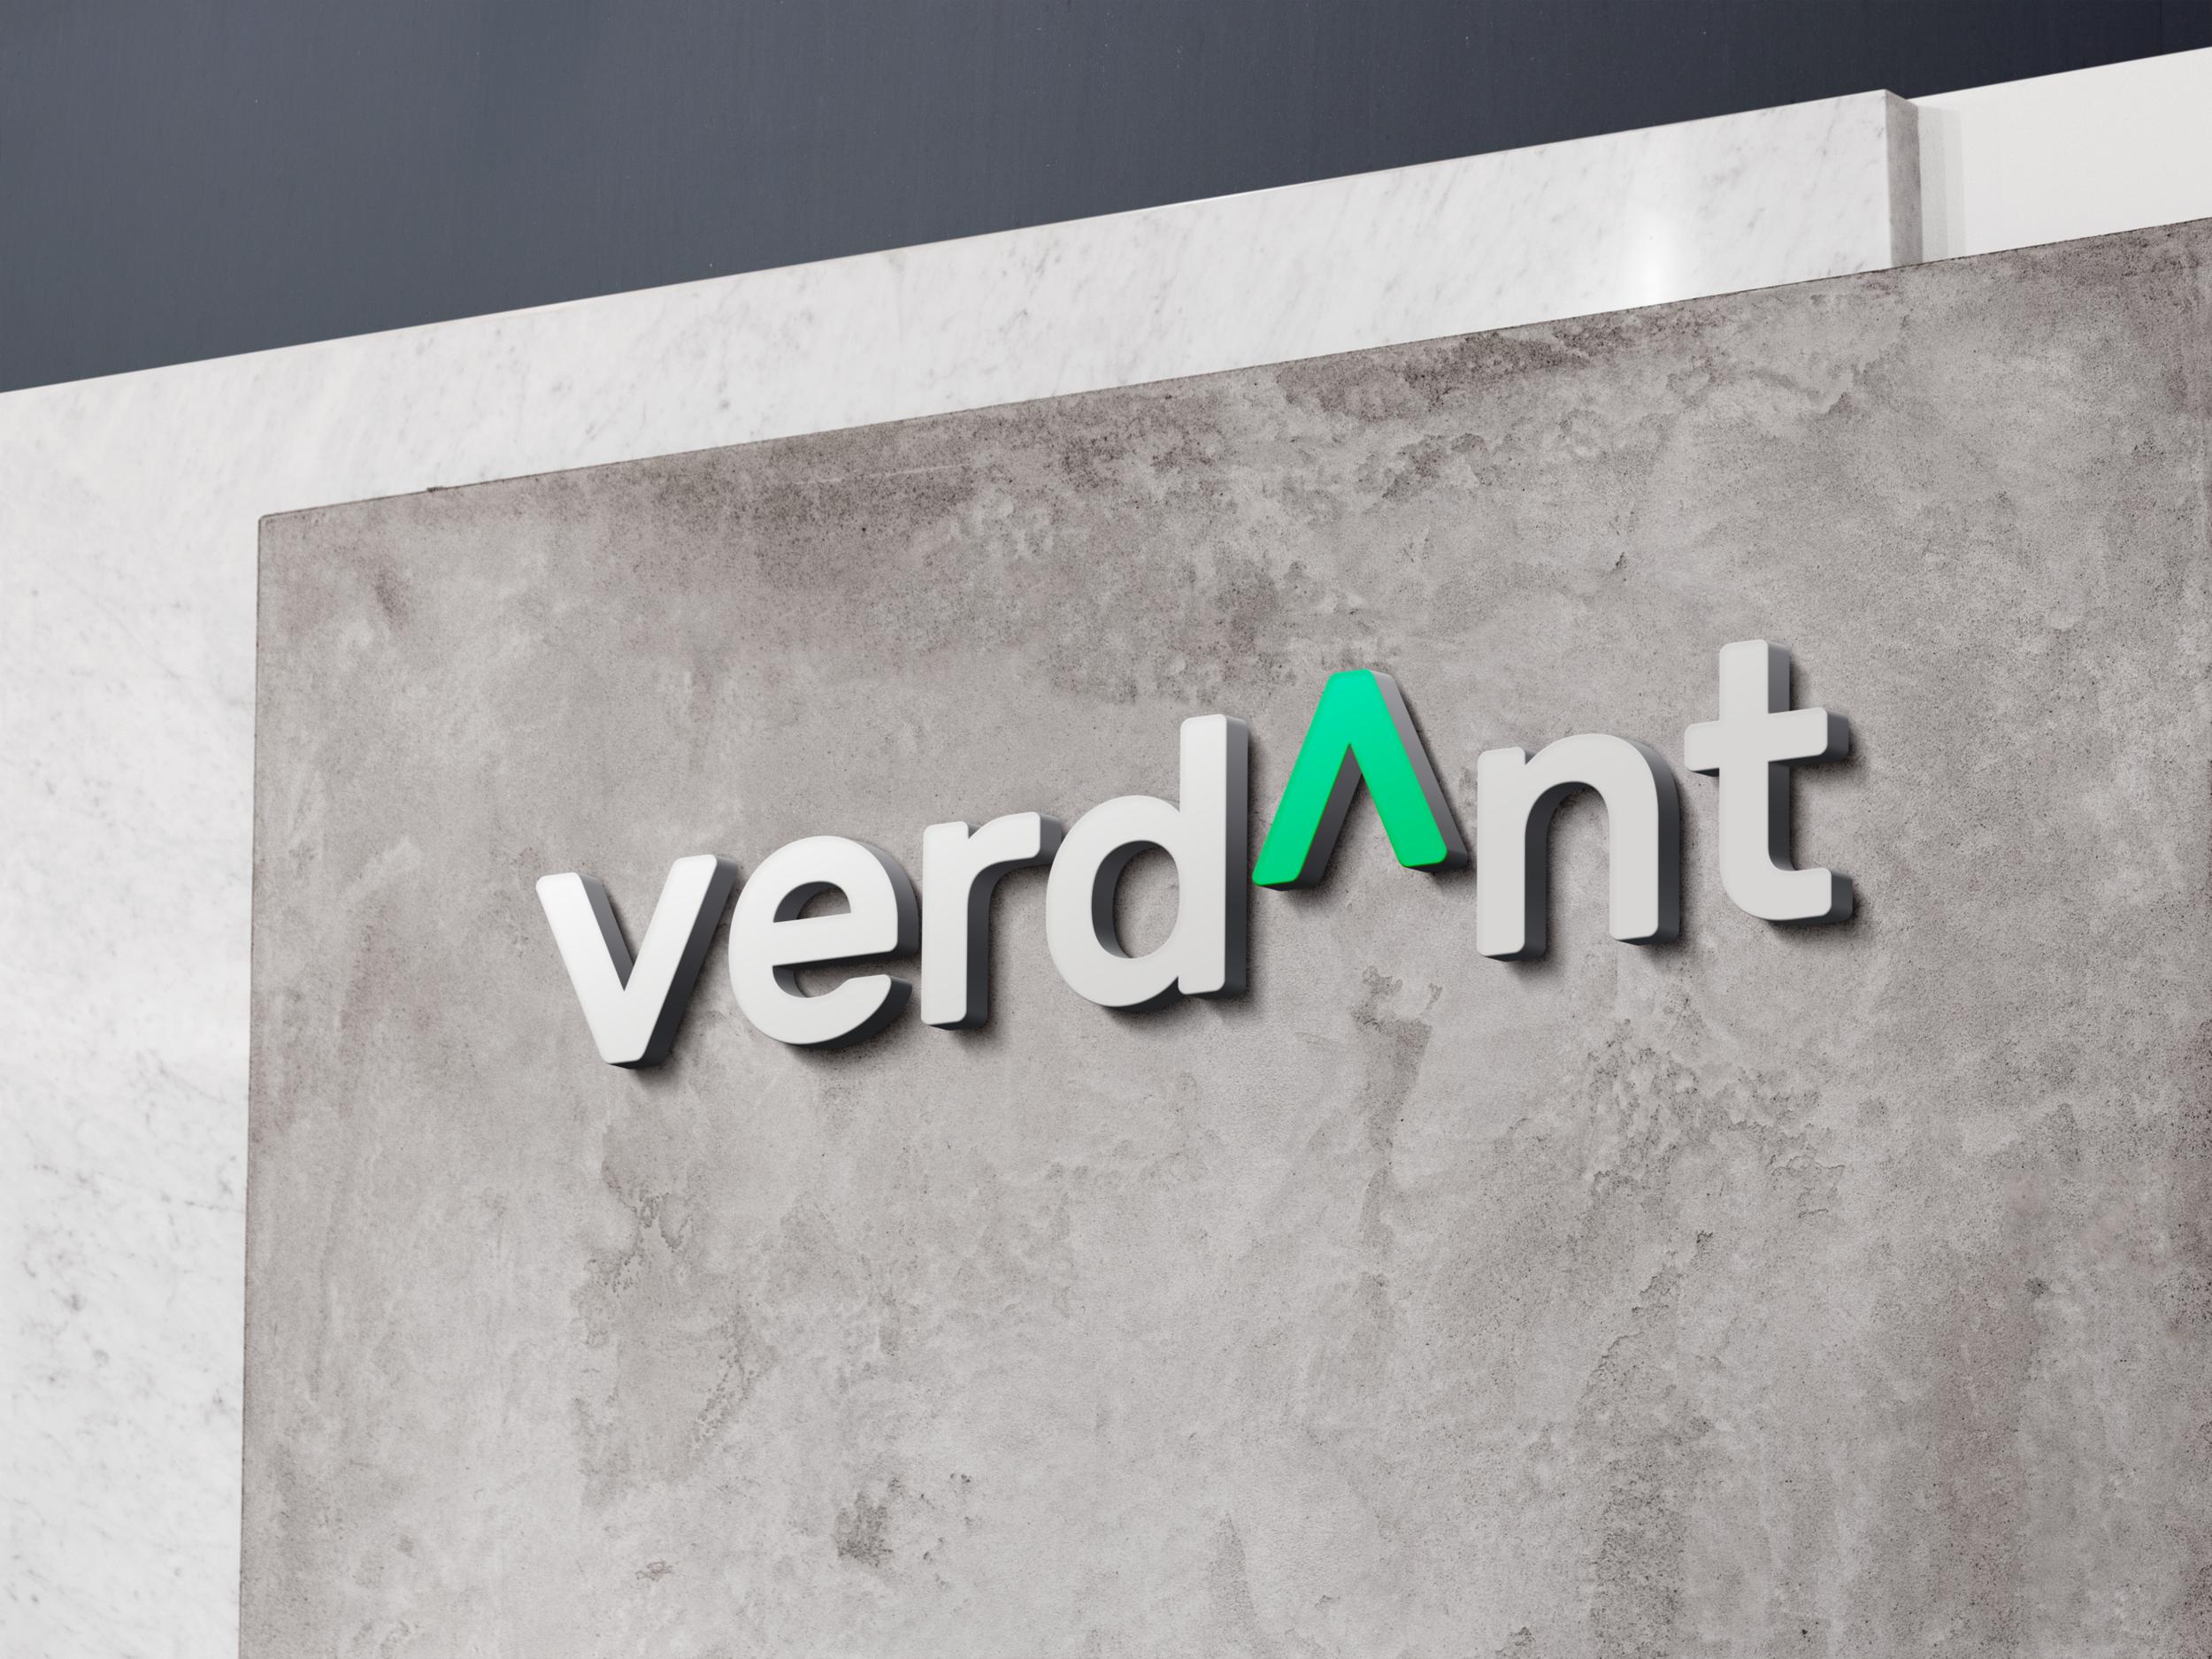 verdant_3Dwall.png